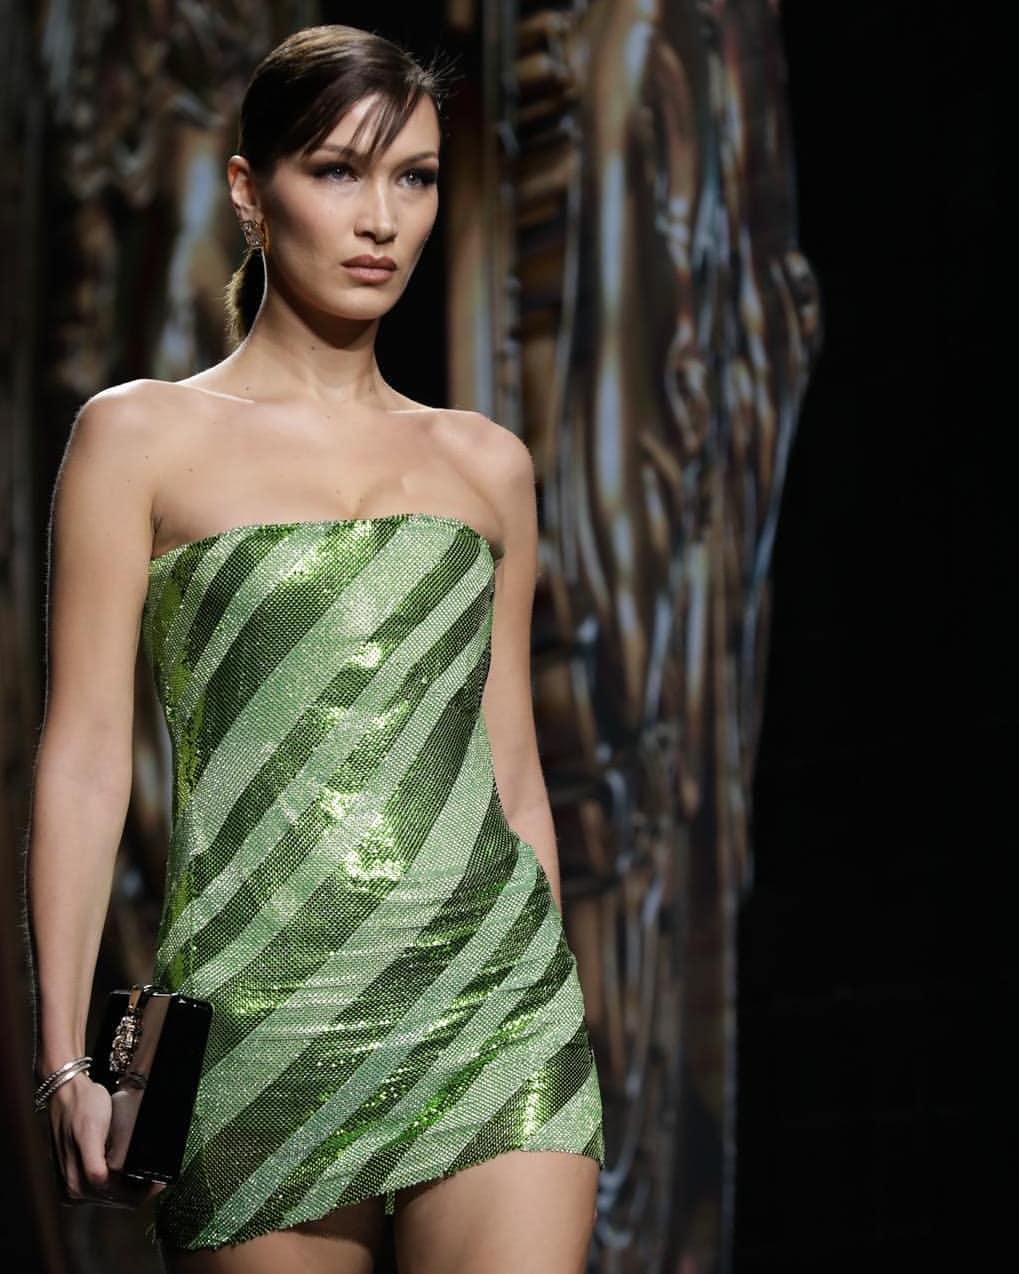 bella Hadid x Versace - Neomag.